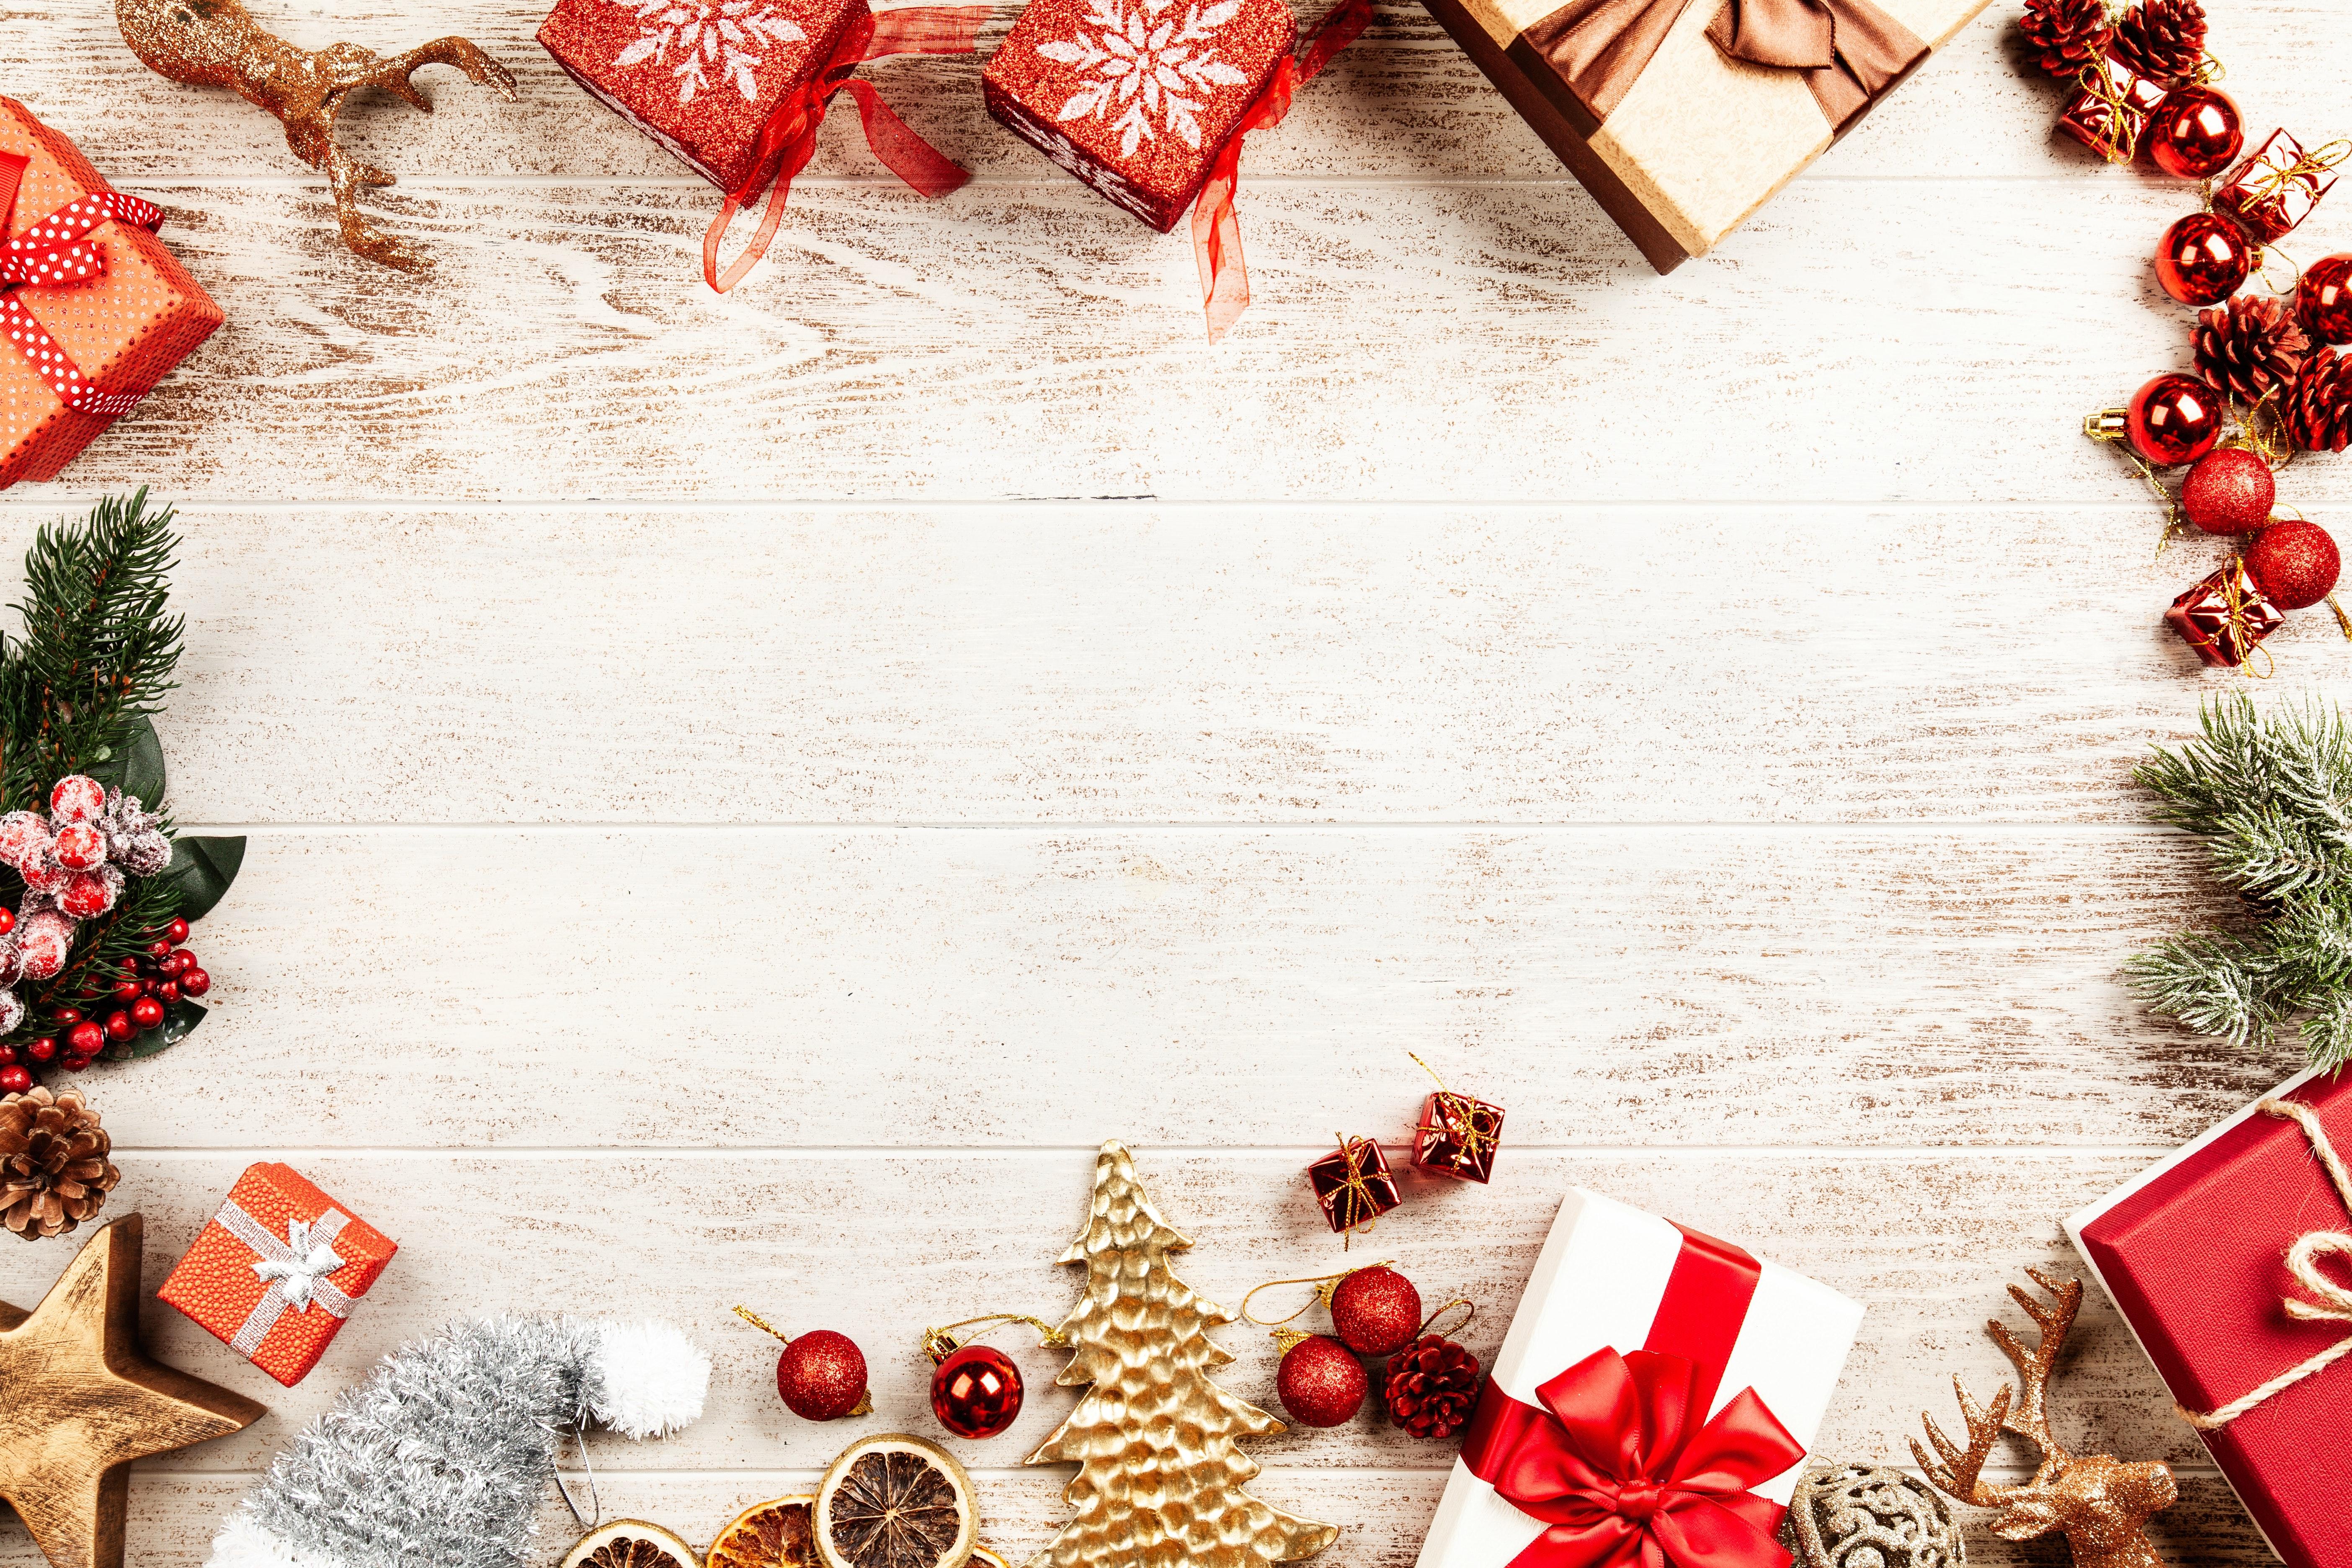 1000+ Engaging Christmas Decorations Photos · Pexels · Free Stock Photos